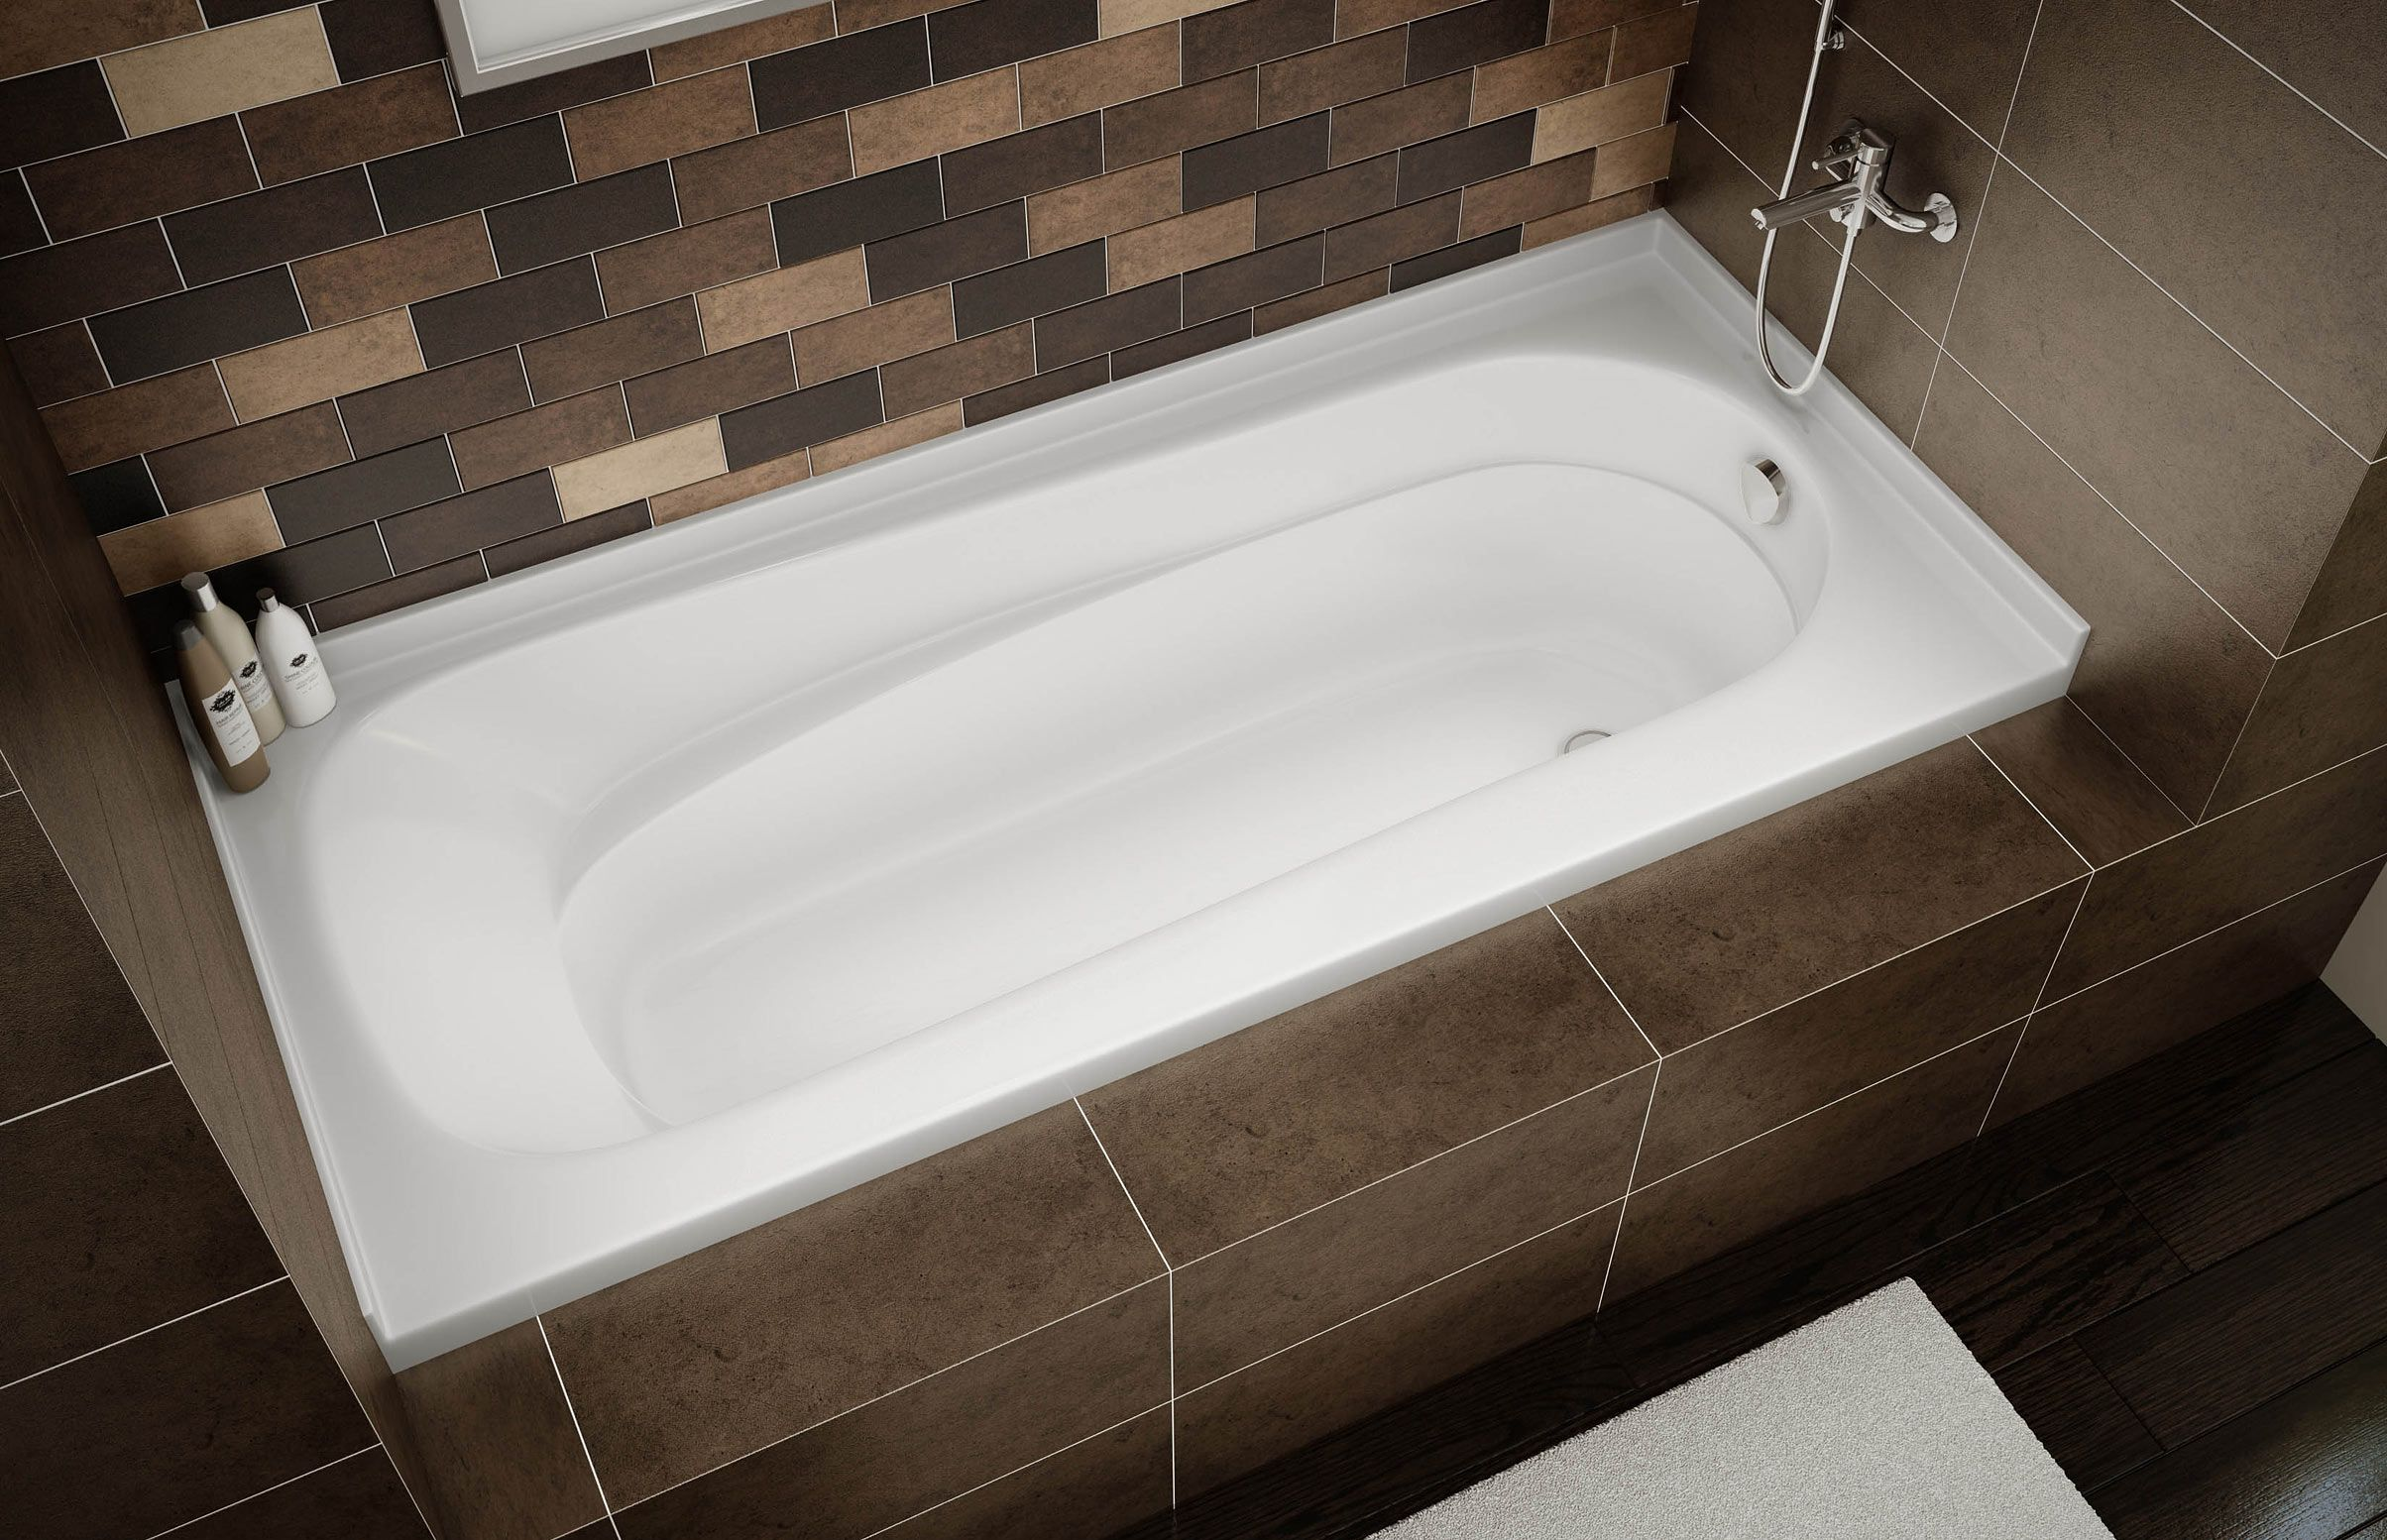 Maax Casa Soaker Tub | Small Bathroom Makeover | Pinterest | Small Bathroom  And Tubs